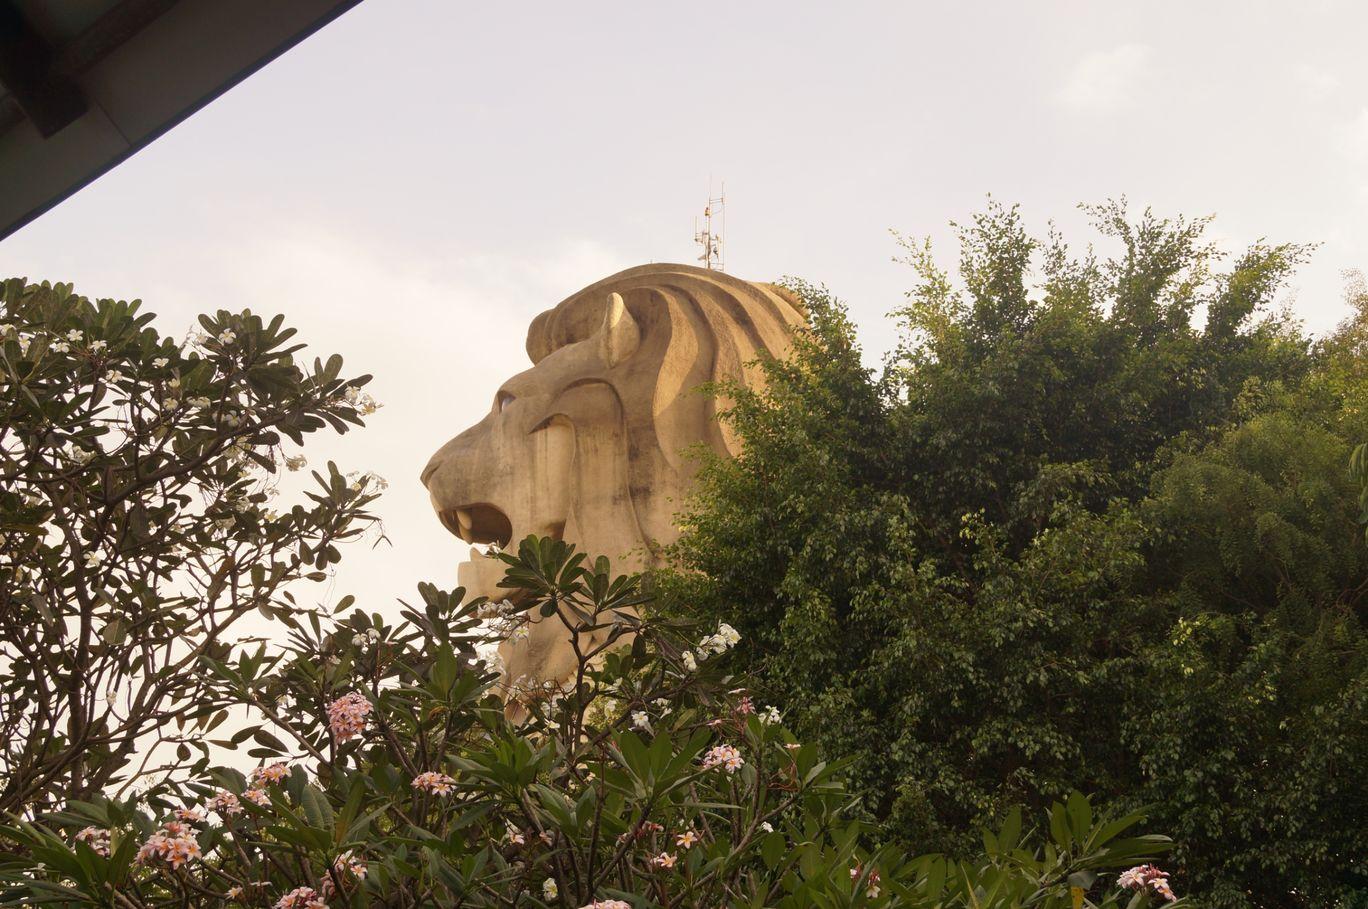 Photo of Sentosa Merlion By Rudranksh Kamath